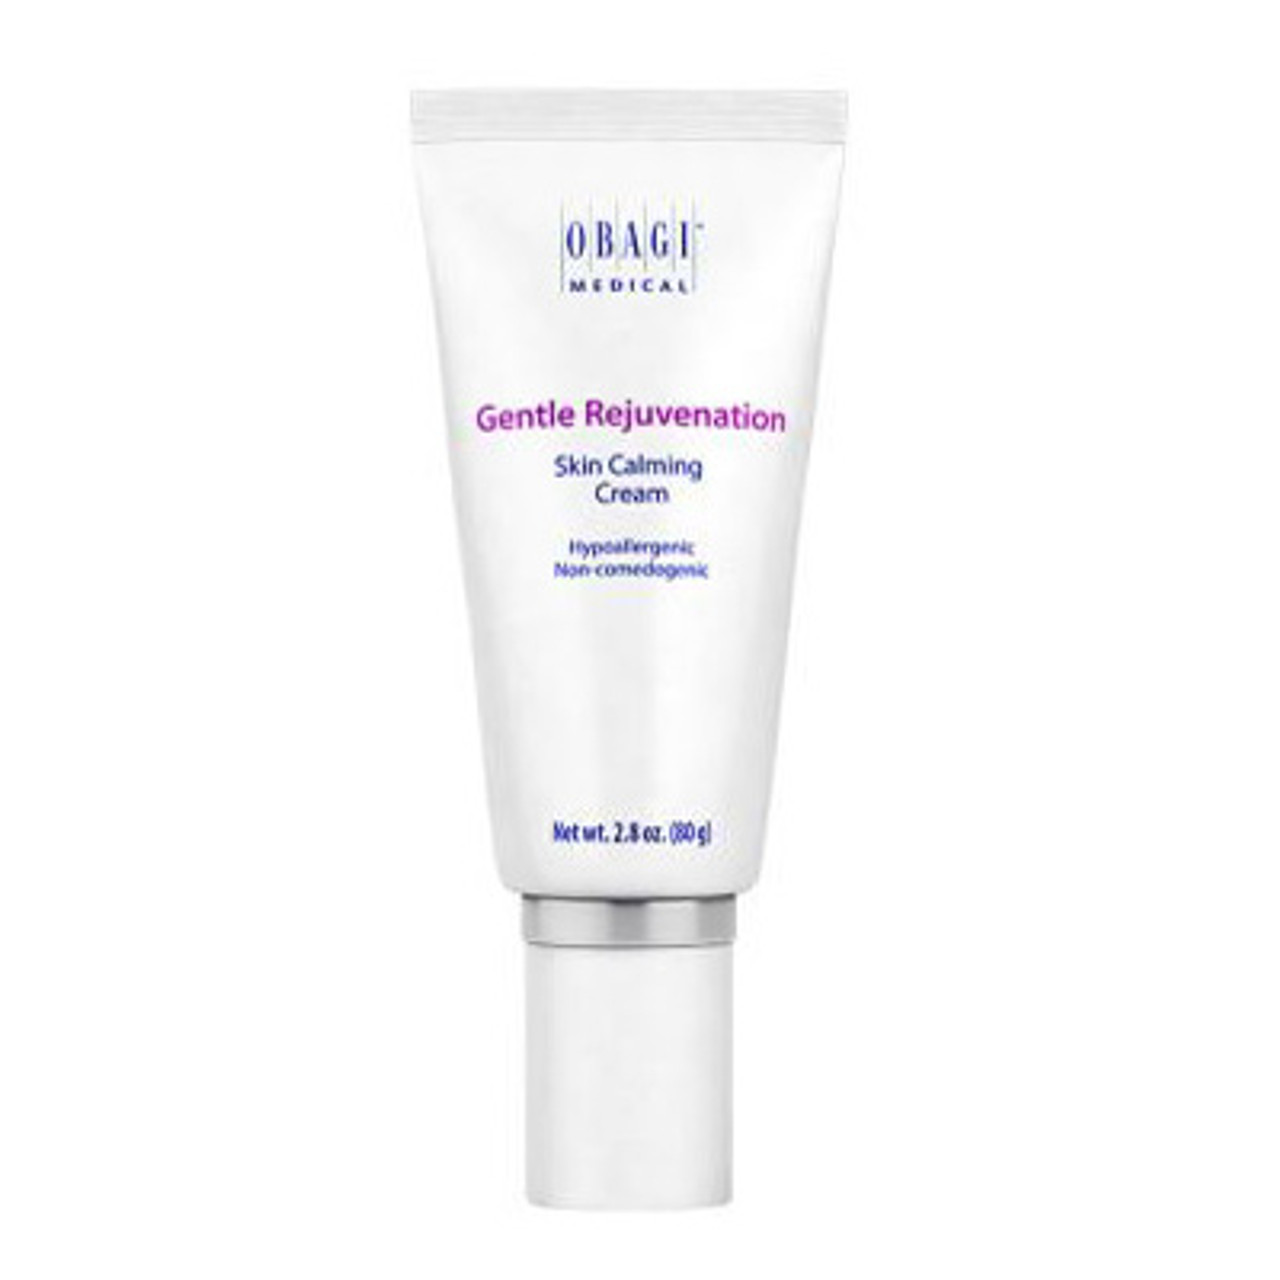 Obagi Gentle Rejuvenation Skin Calming Cream (discontinued) BeautifiedYou.com